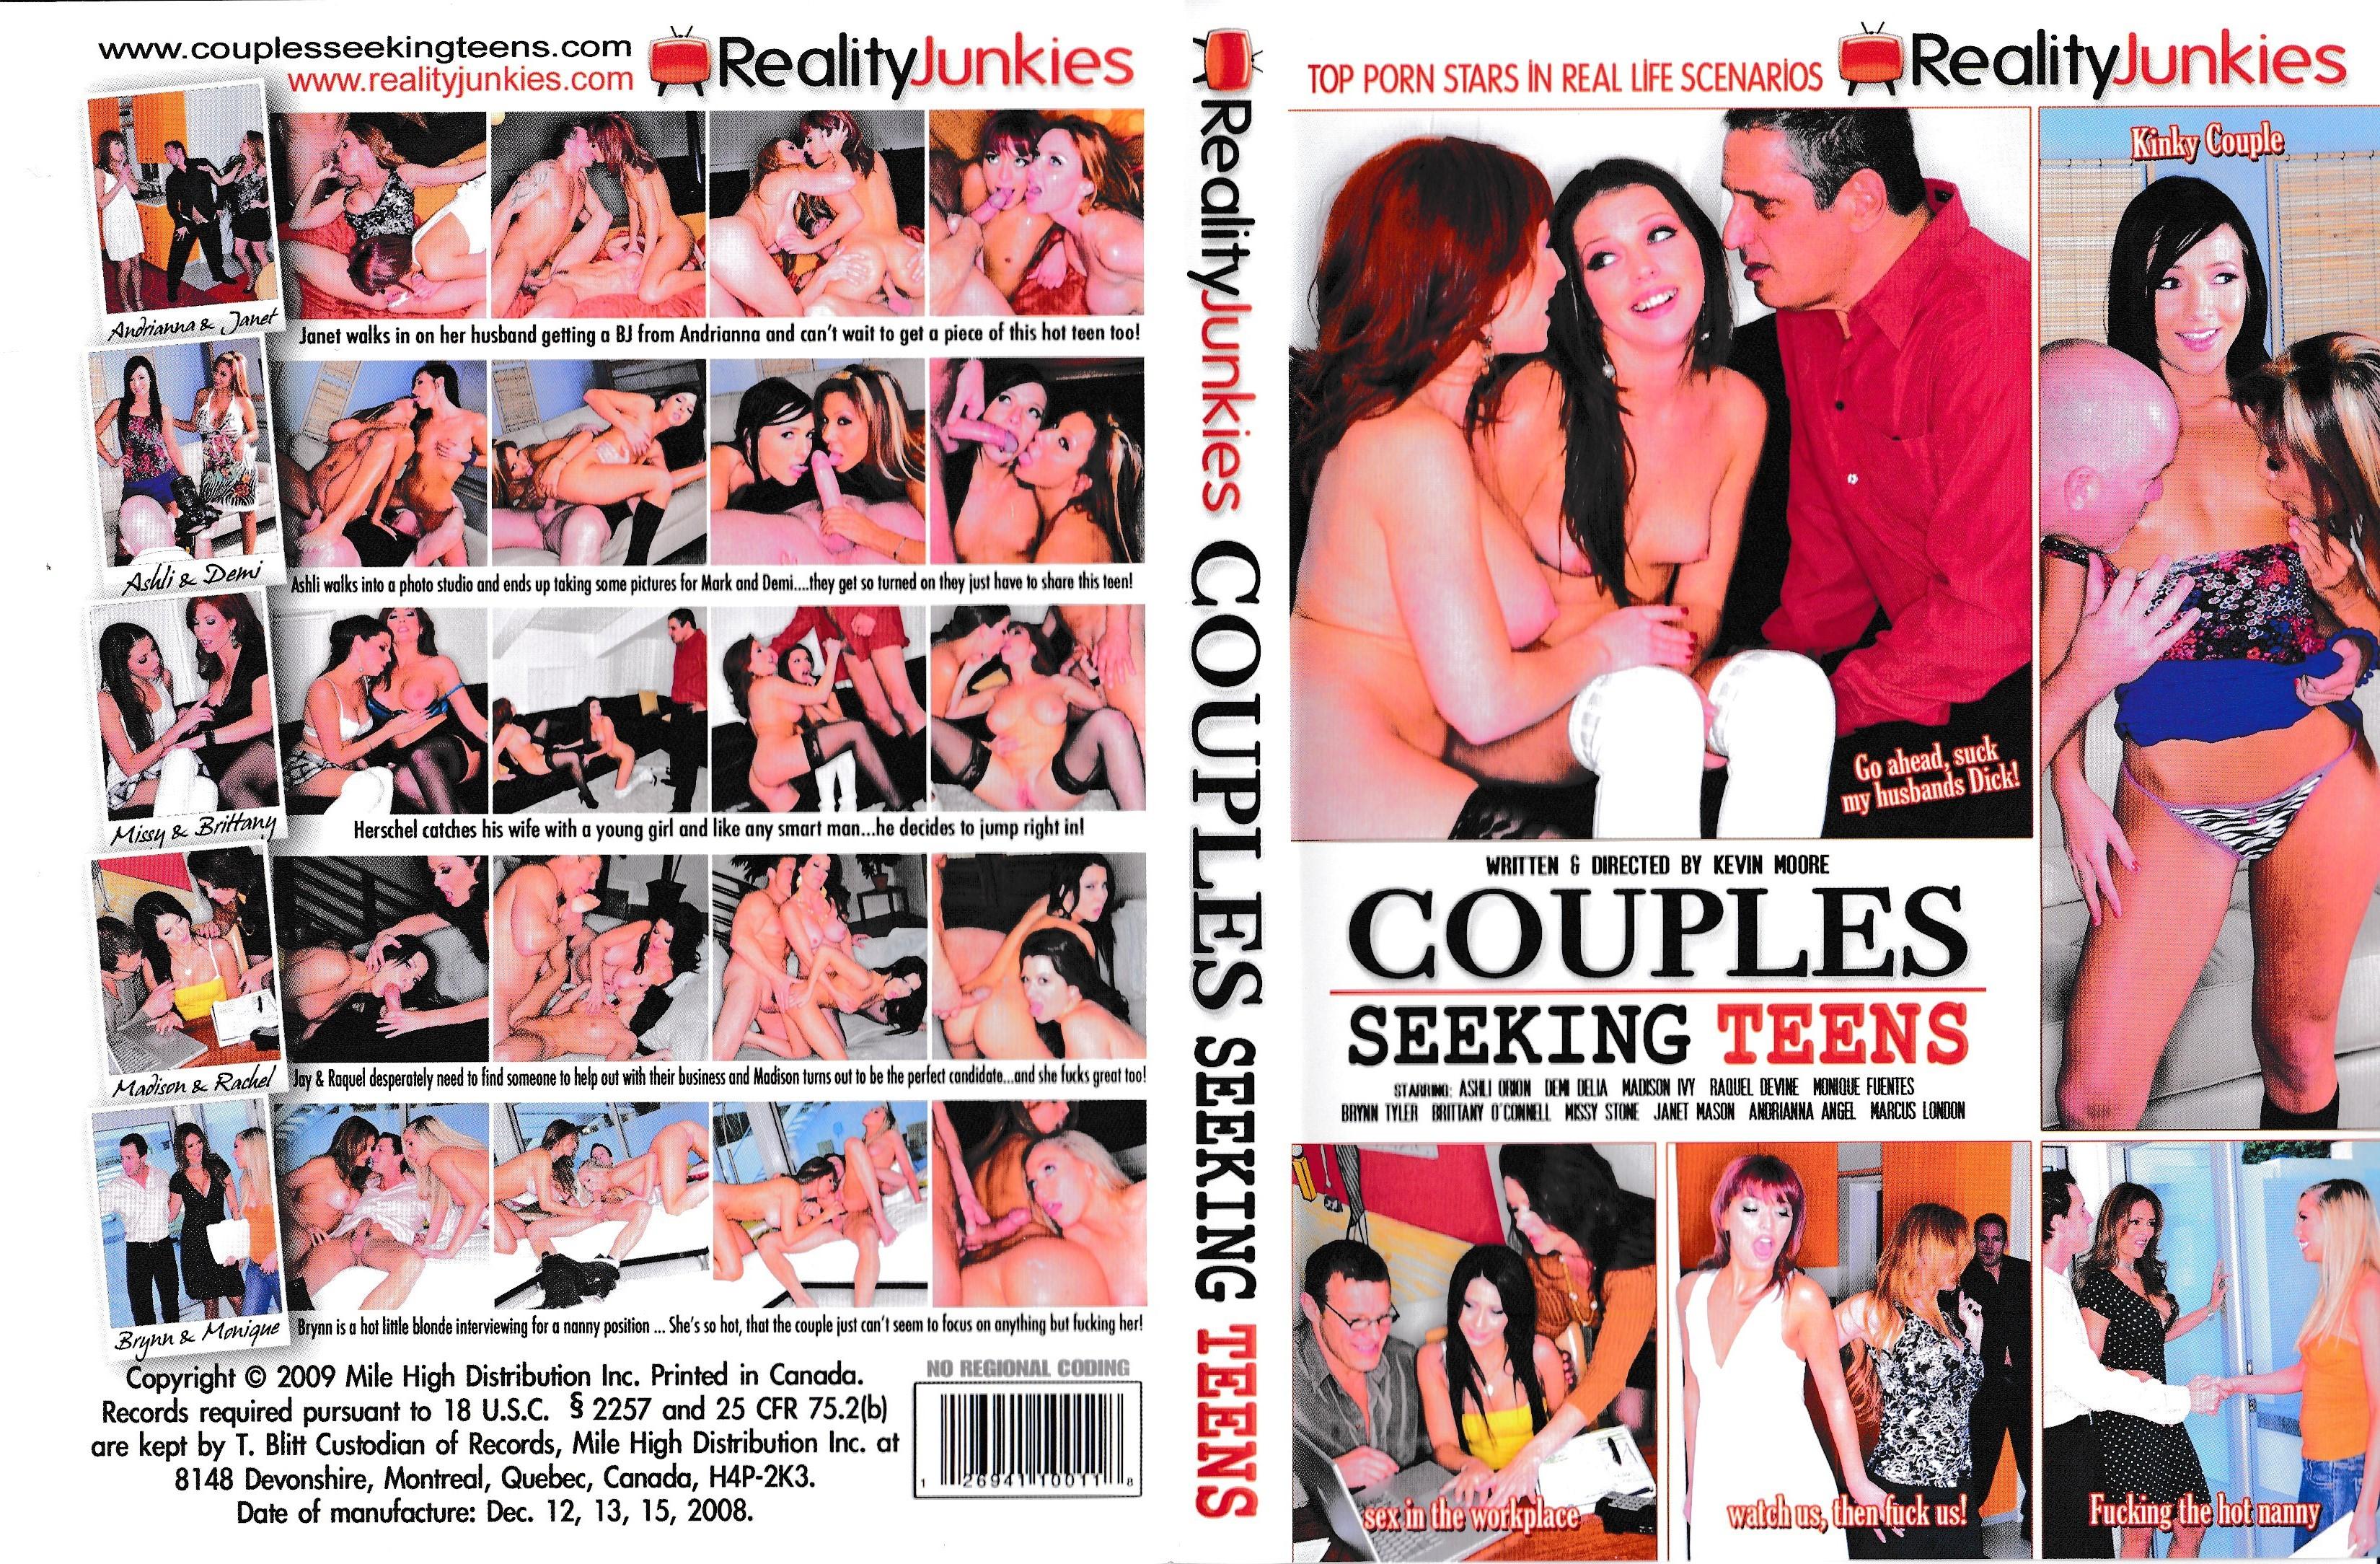 Ch 23:  Couples Seeking Teens